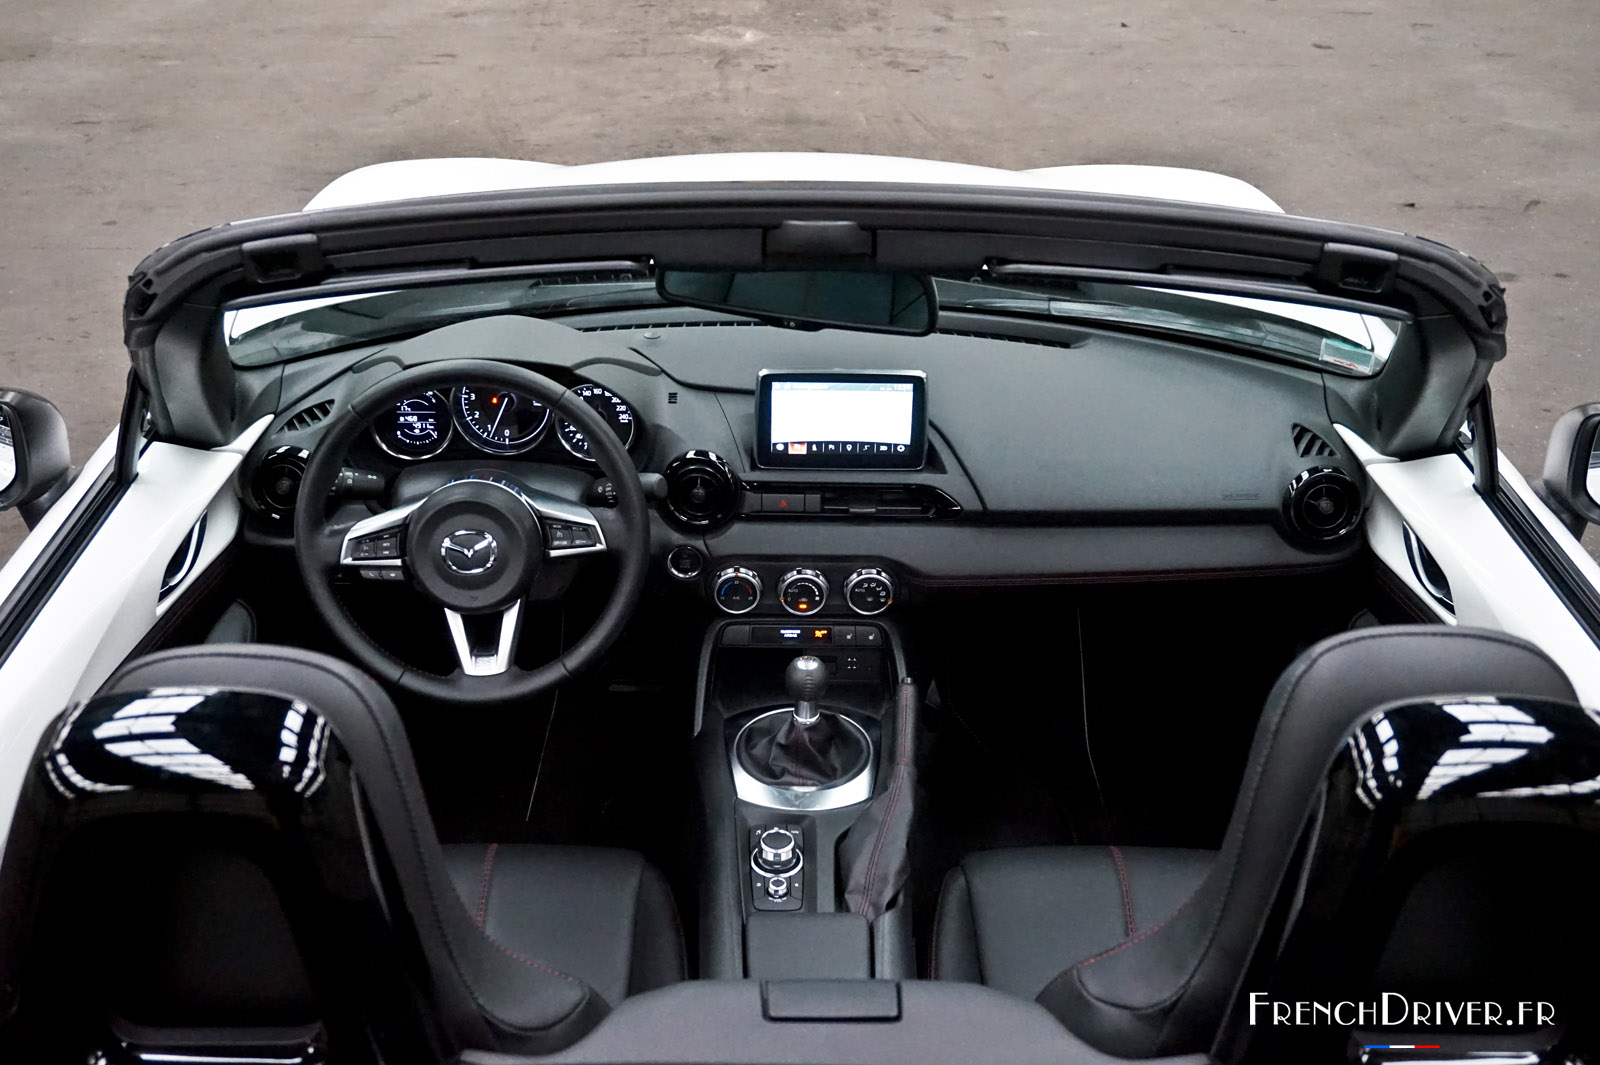 essai de la mazda mx 5 la quintessence du plaisir automobile french driver. Black Bedroom Furniture Sets. Home Design Ideas